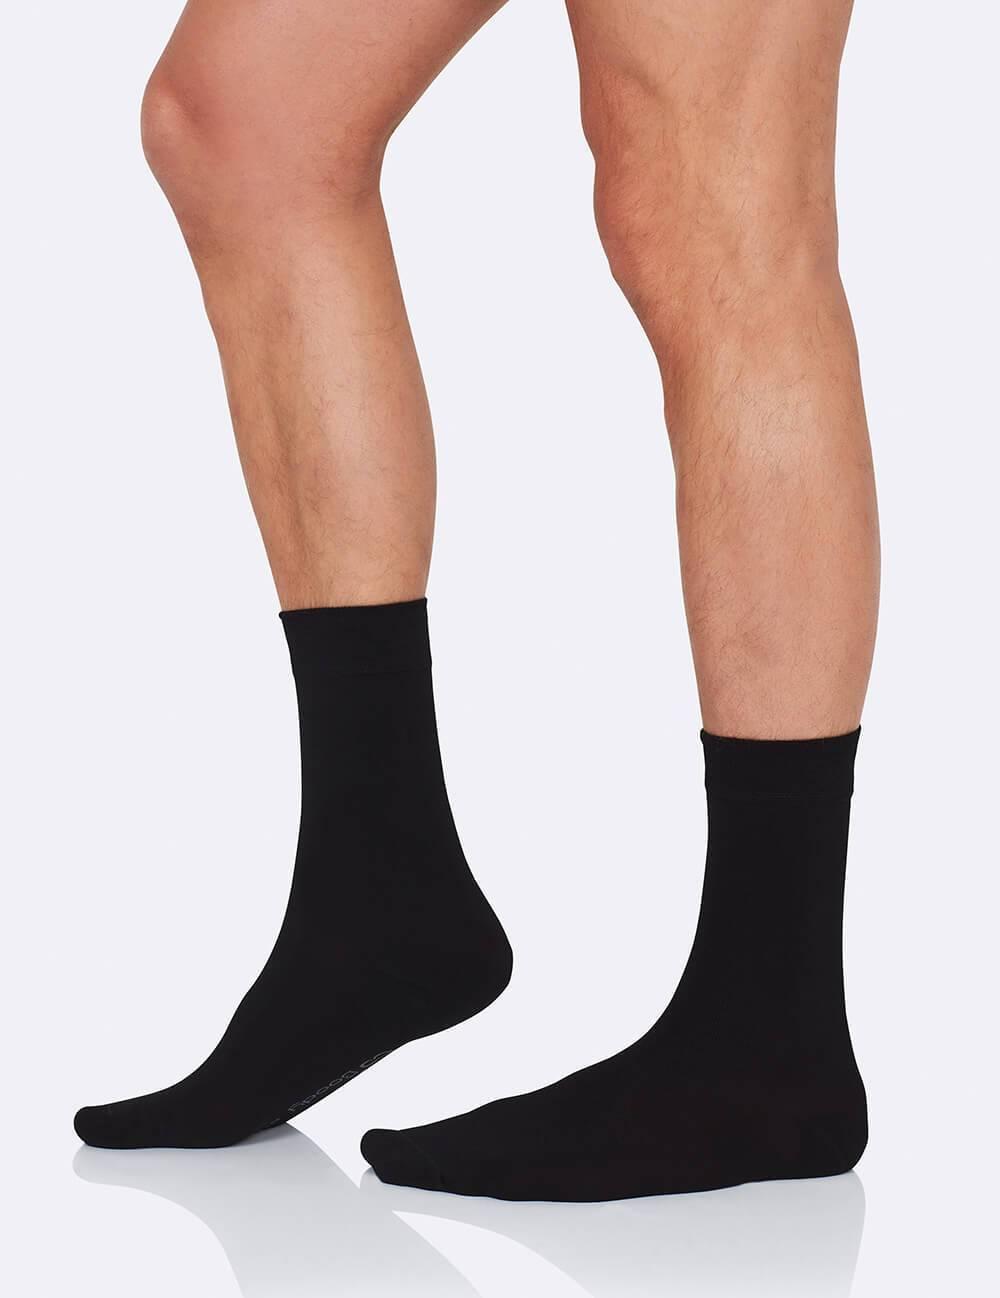 a940beb05c241 Mens Business Socks – Black